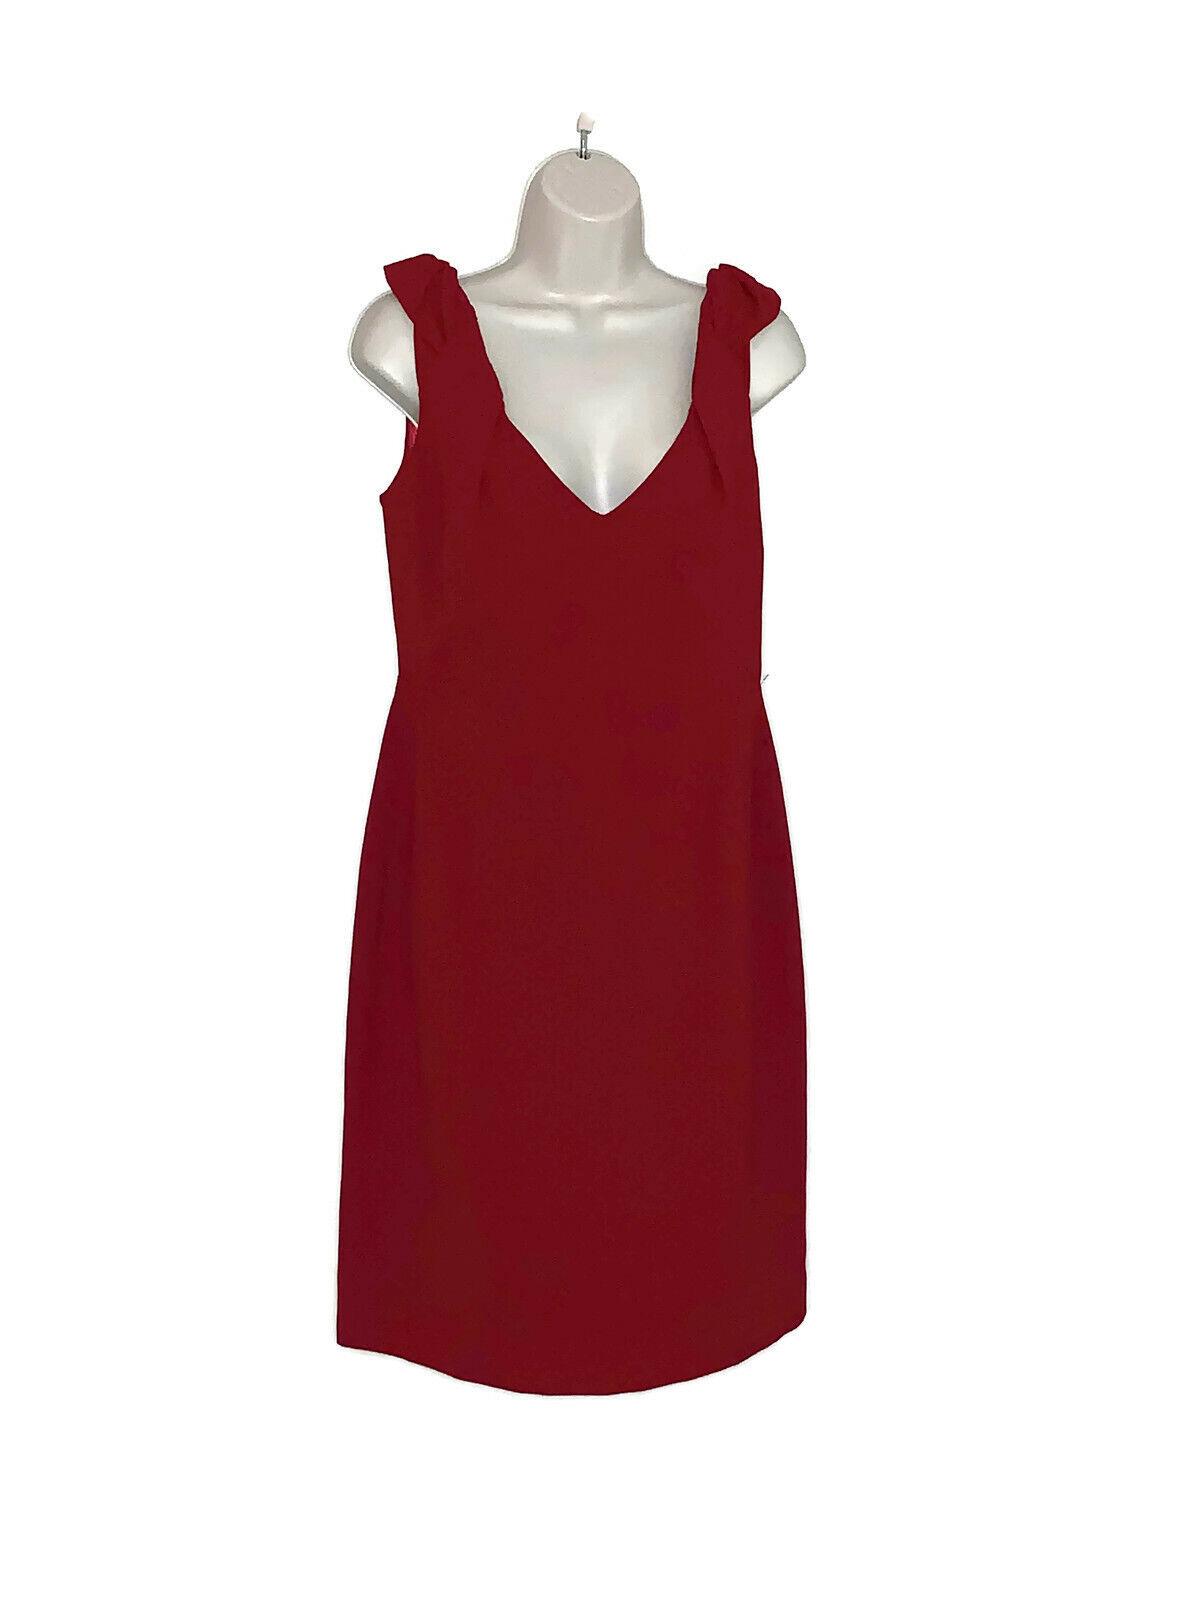 ELIE TAHARI Größe 10  Merotith  Dress Ruby King Zipper Lined NWT